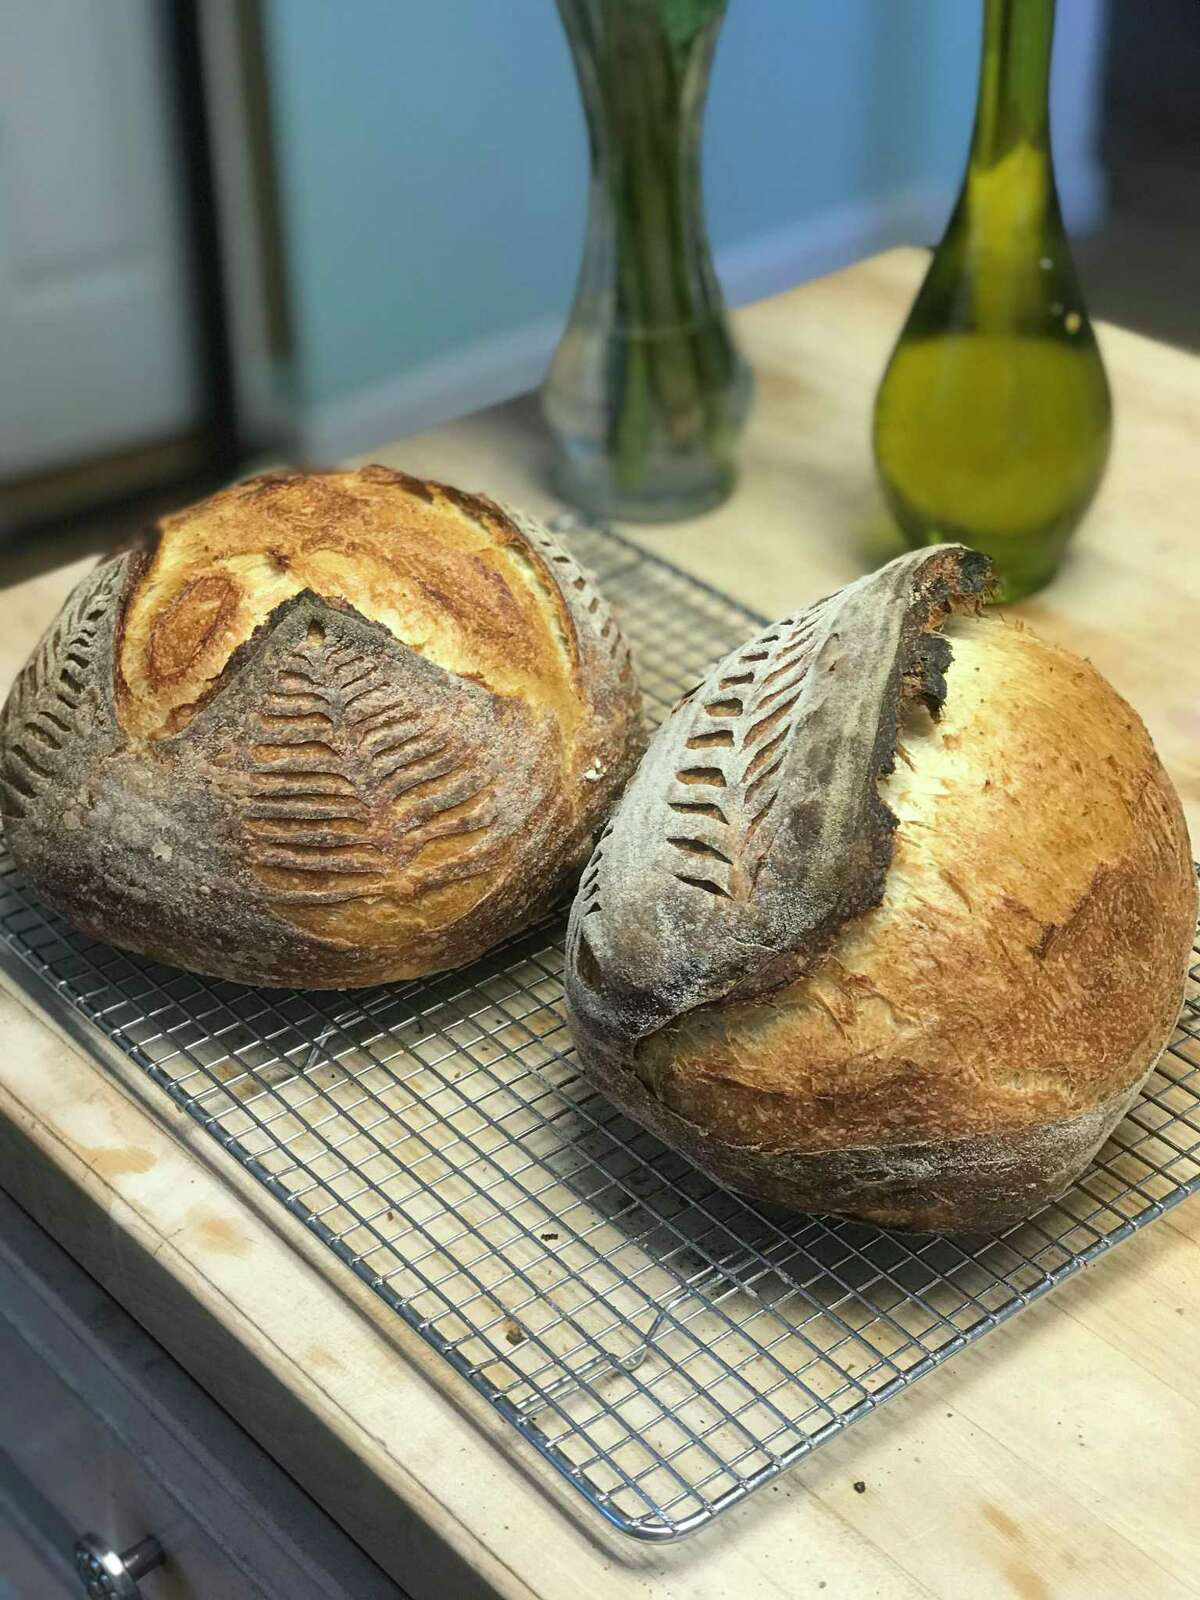 Samples of sourdough bread.